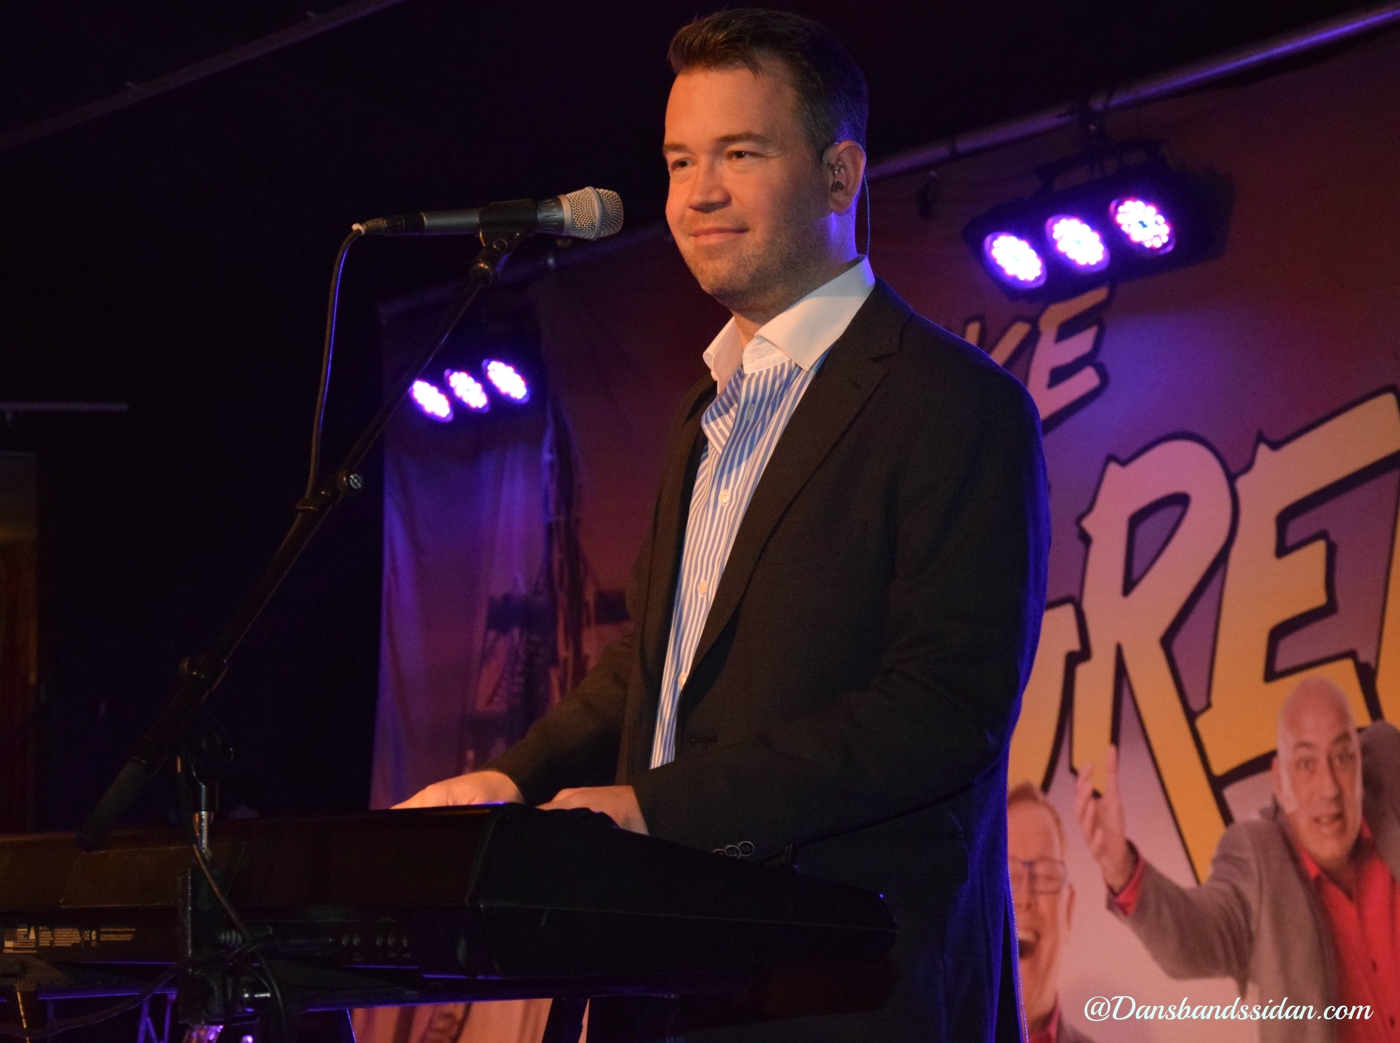 Diverse artister andra sjunger olle ljungstrom